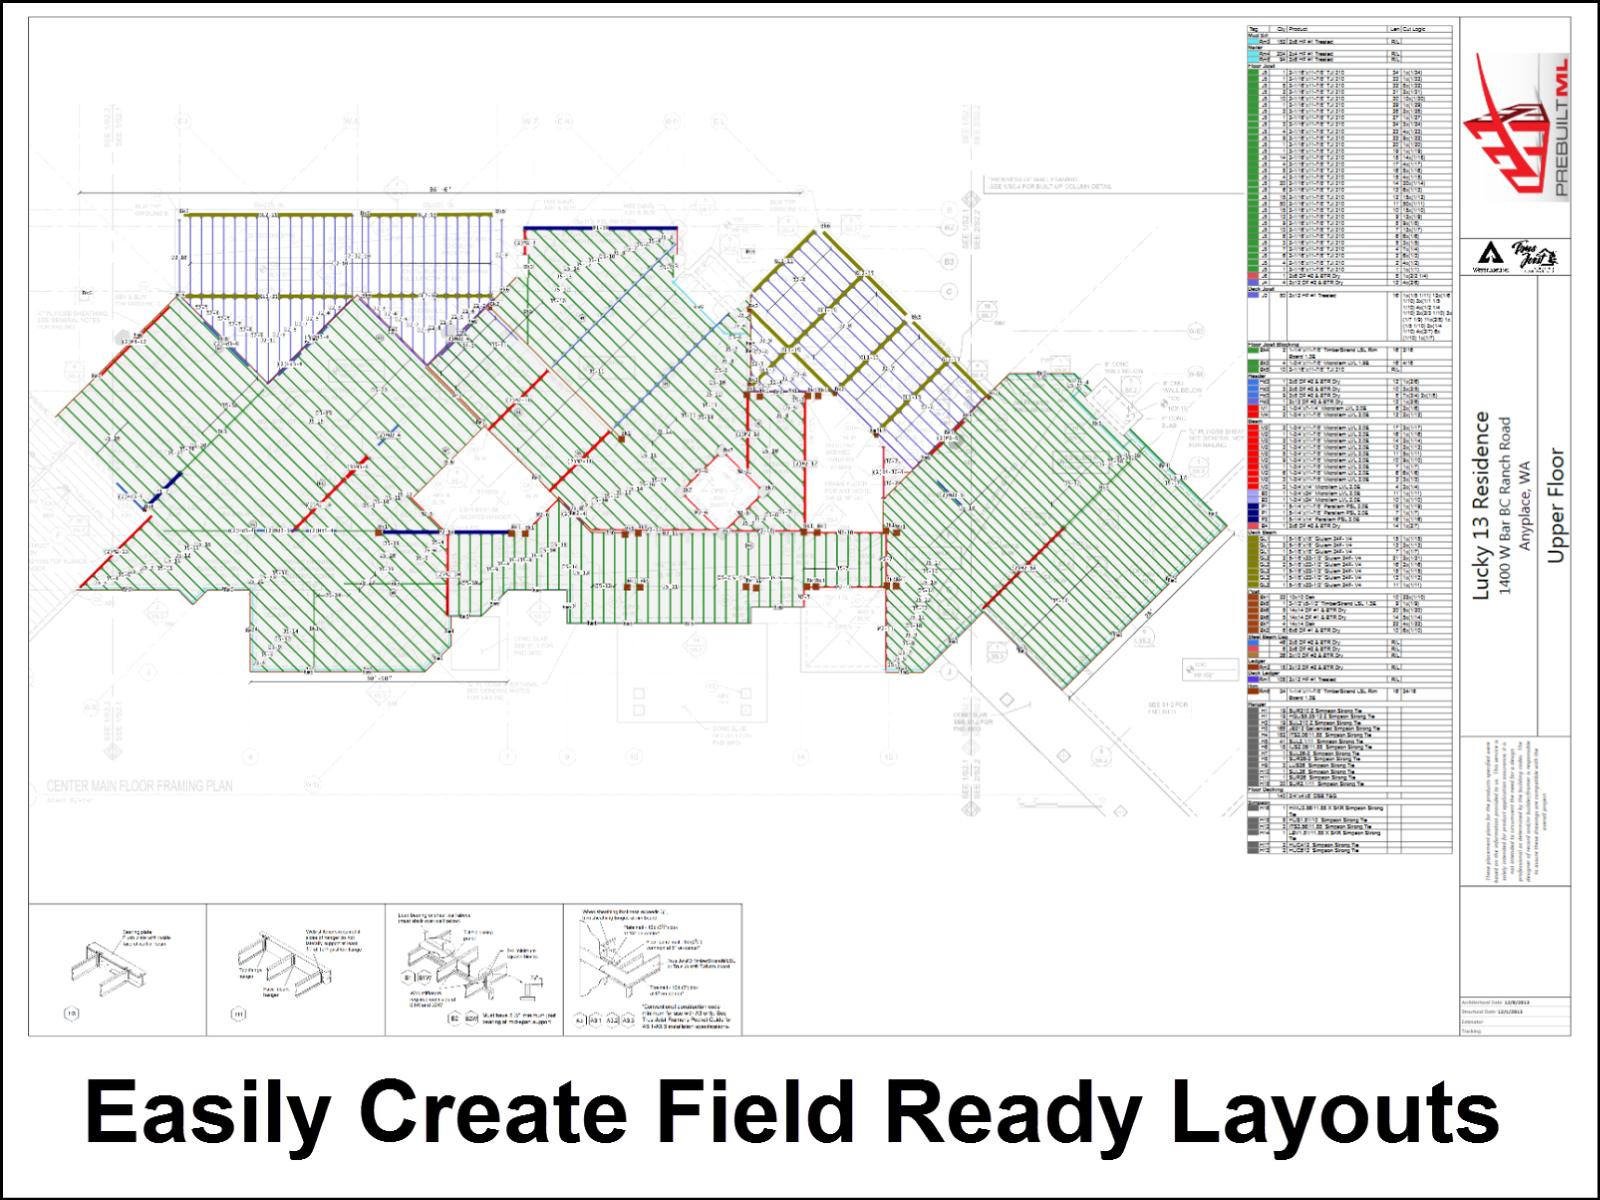 PrebuiltML Software - Create layouts